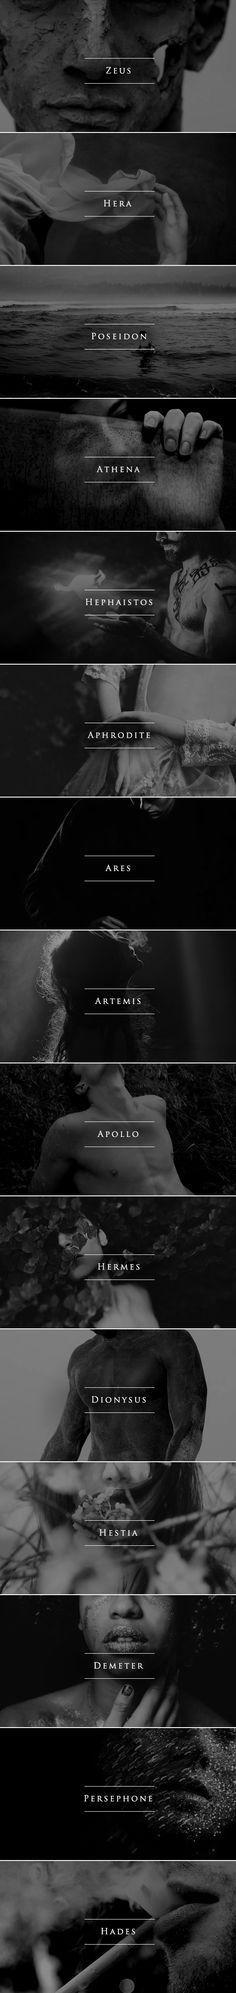 https://photography-classes-workshops.blogspot.com/ #Photography Name Aesthetics | Greek Gods  Goddesses